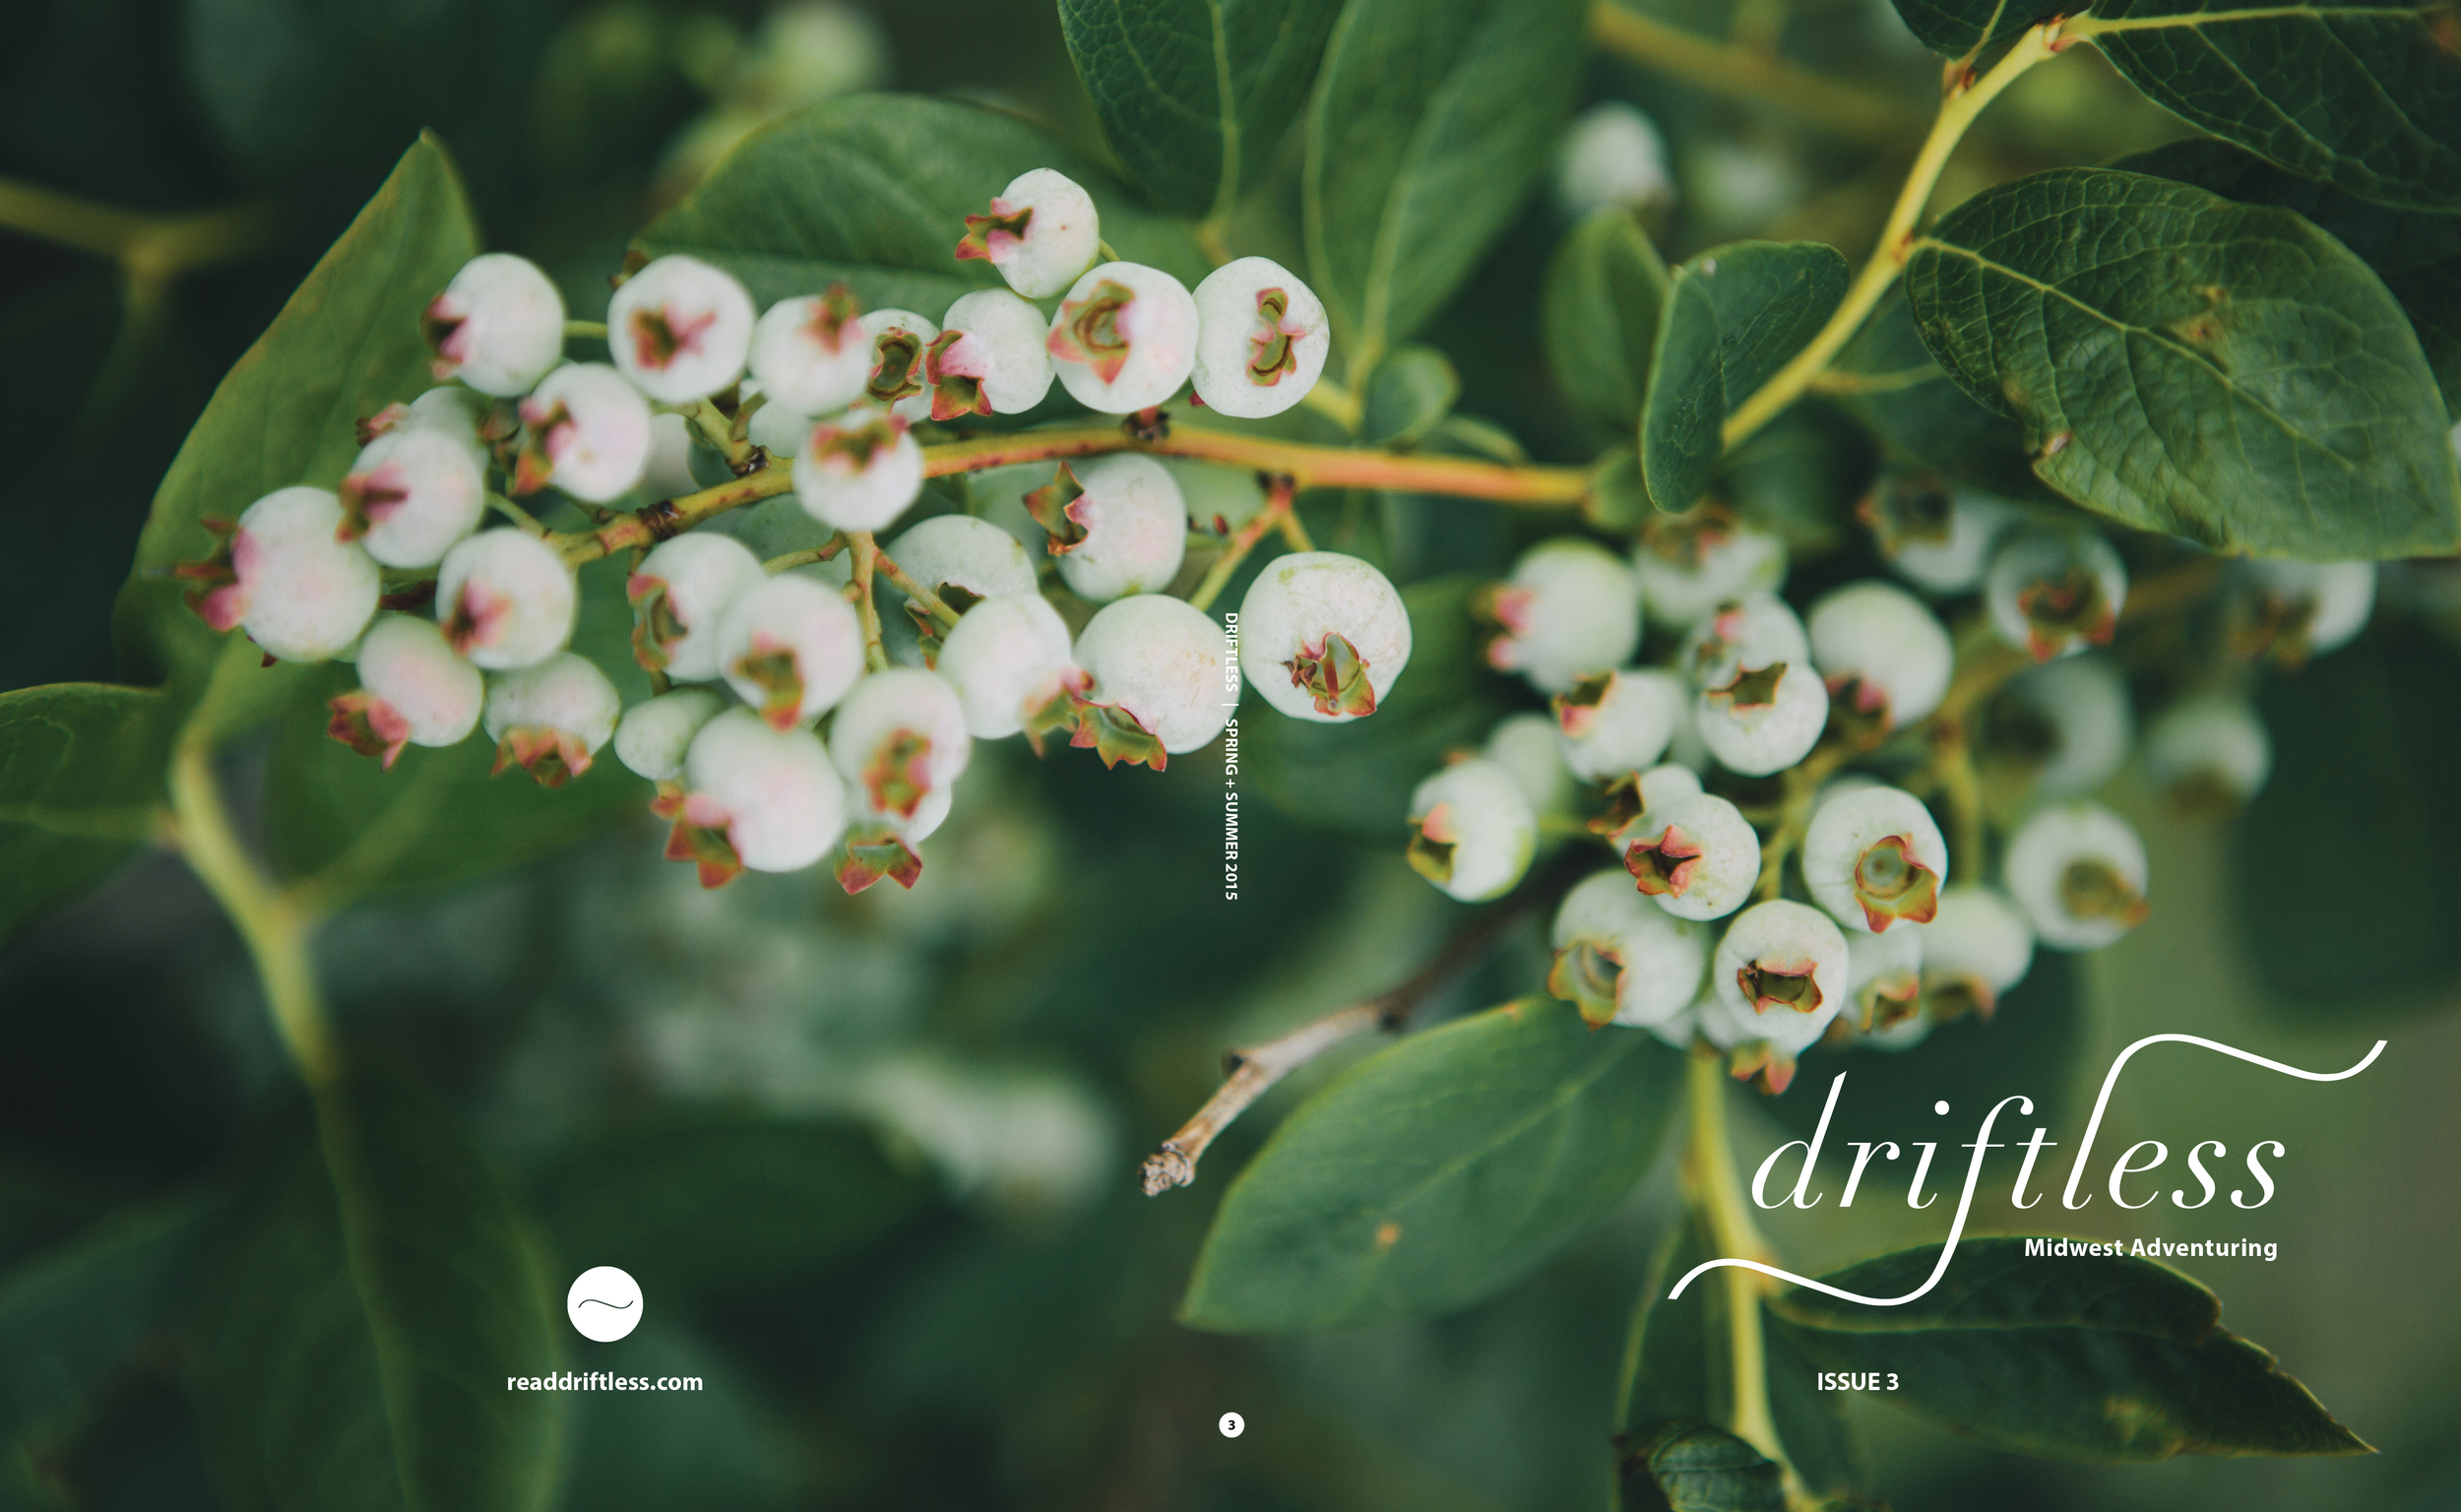 driftless_iss3_print_covers.jpg